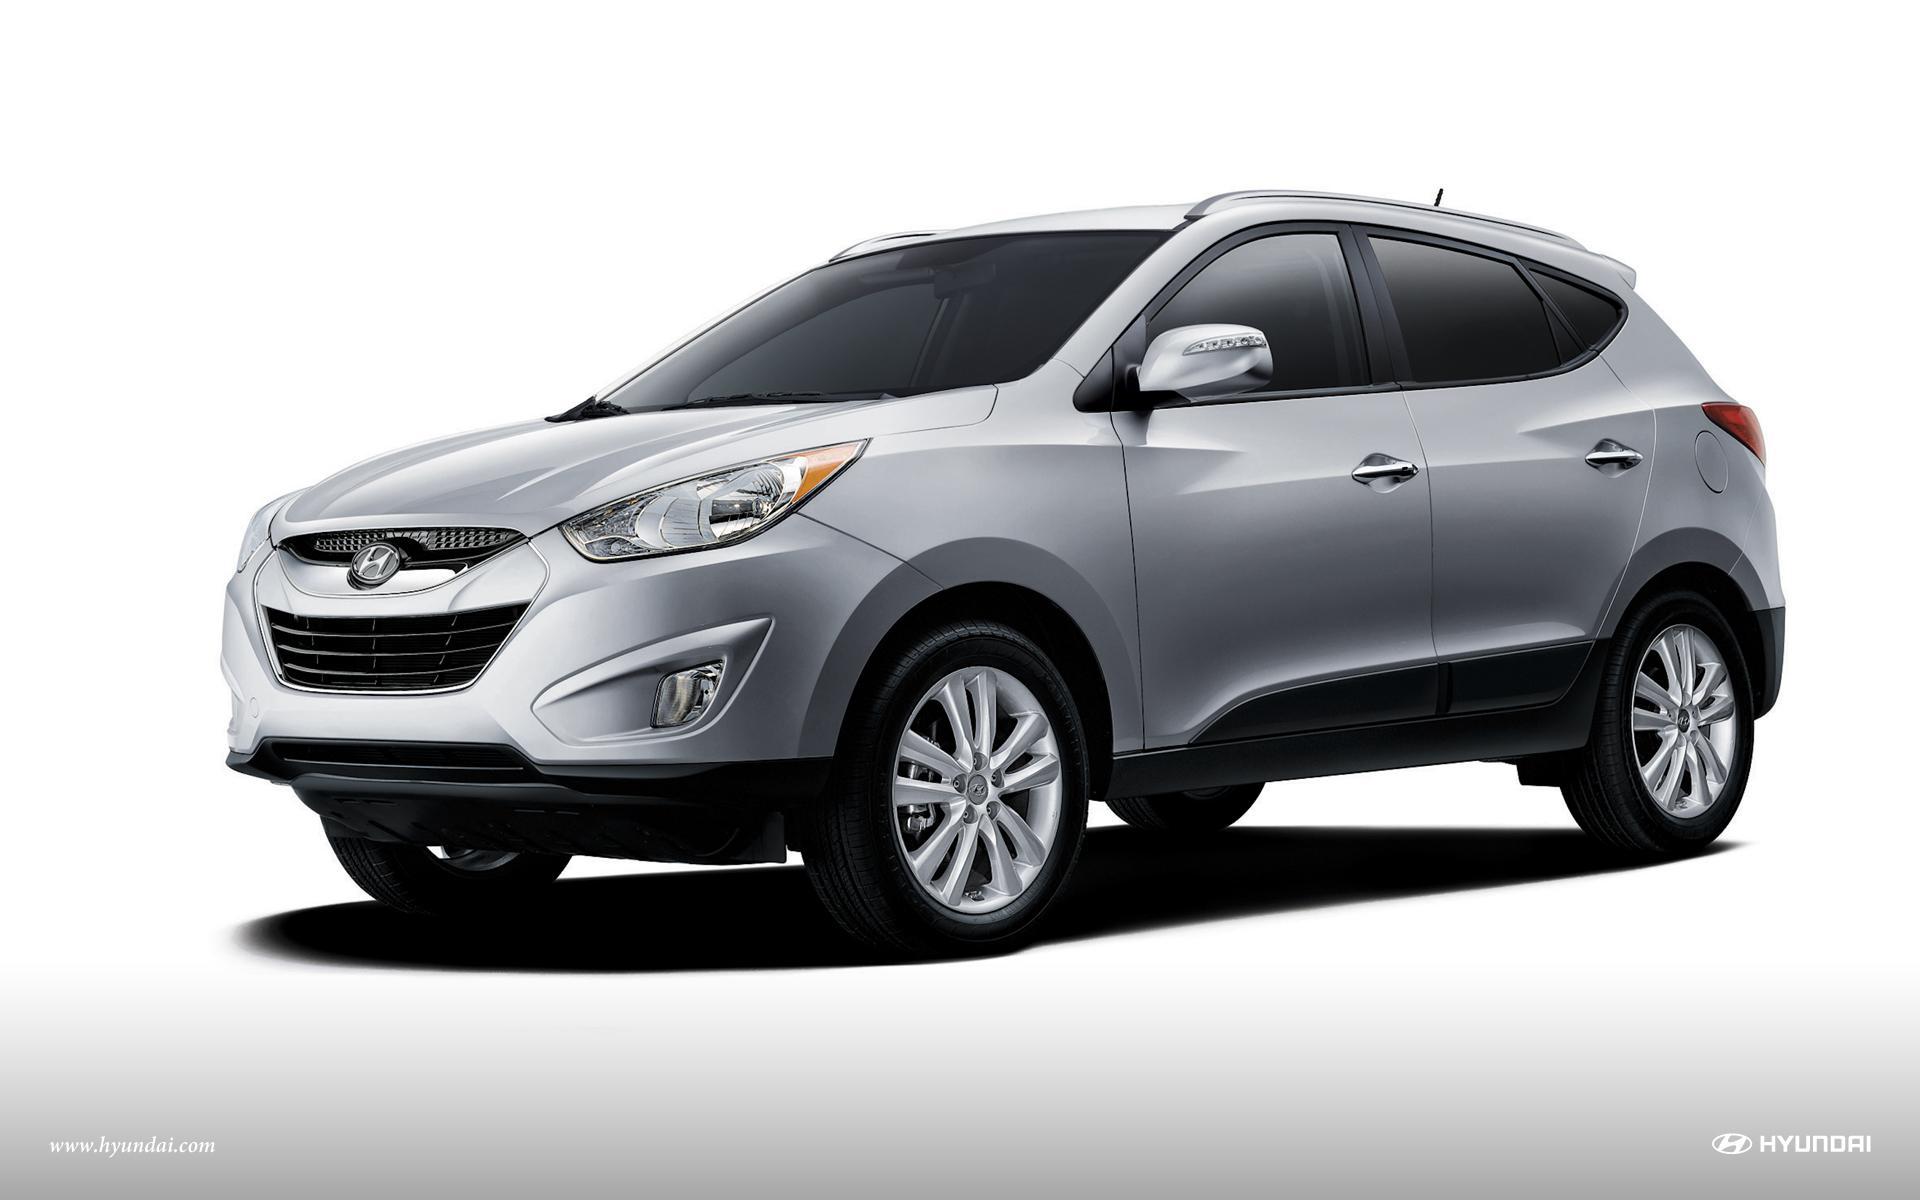 new front gls hyundai chevrolet pzev news auto tucson coverage seat car show suv reviews la